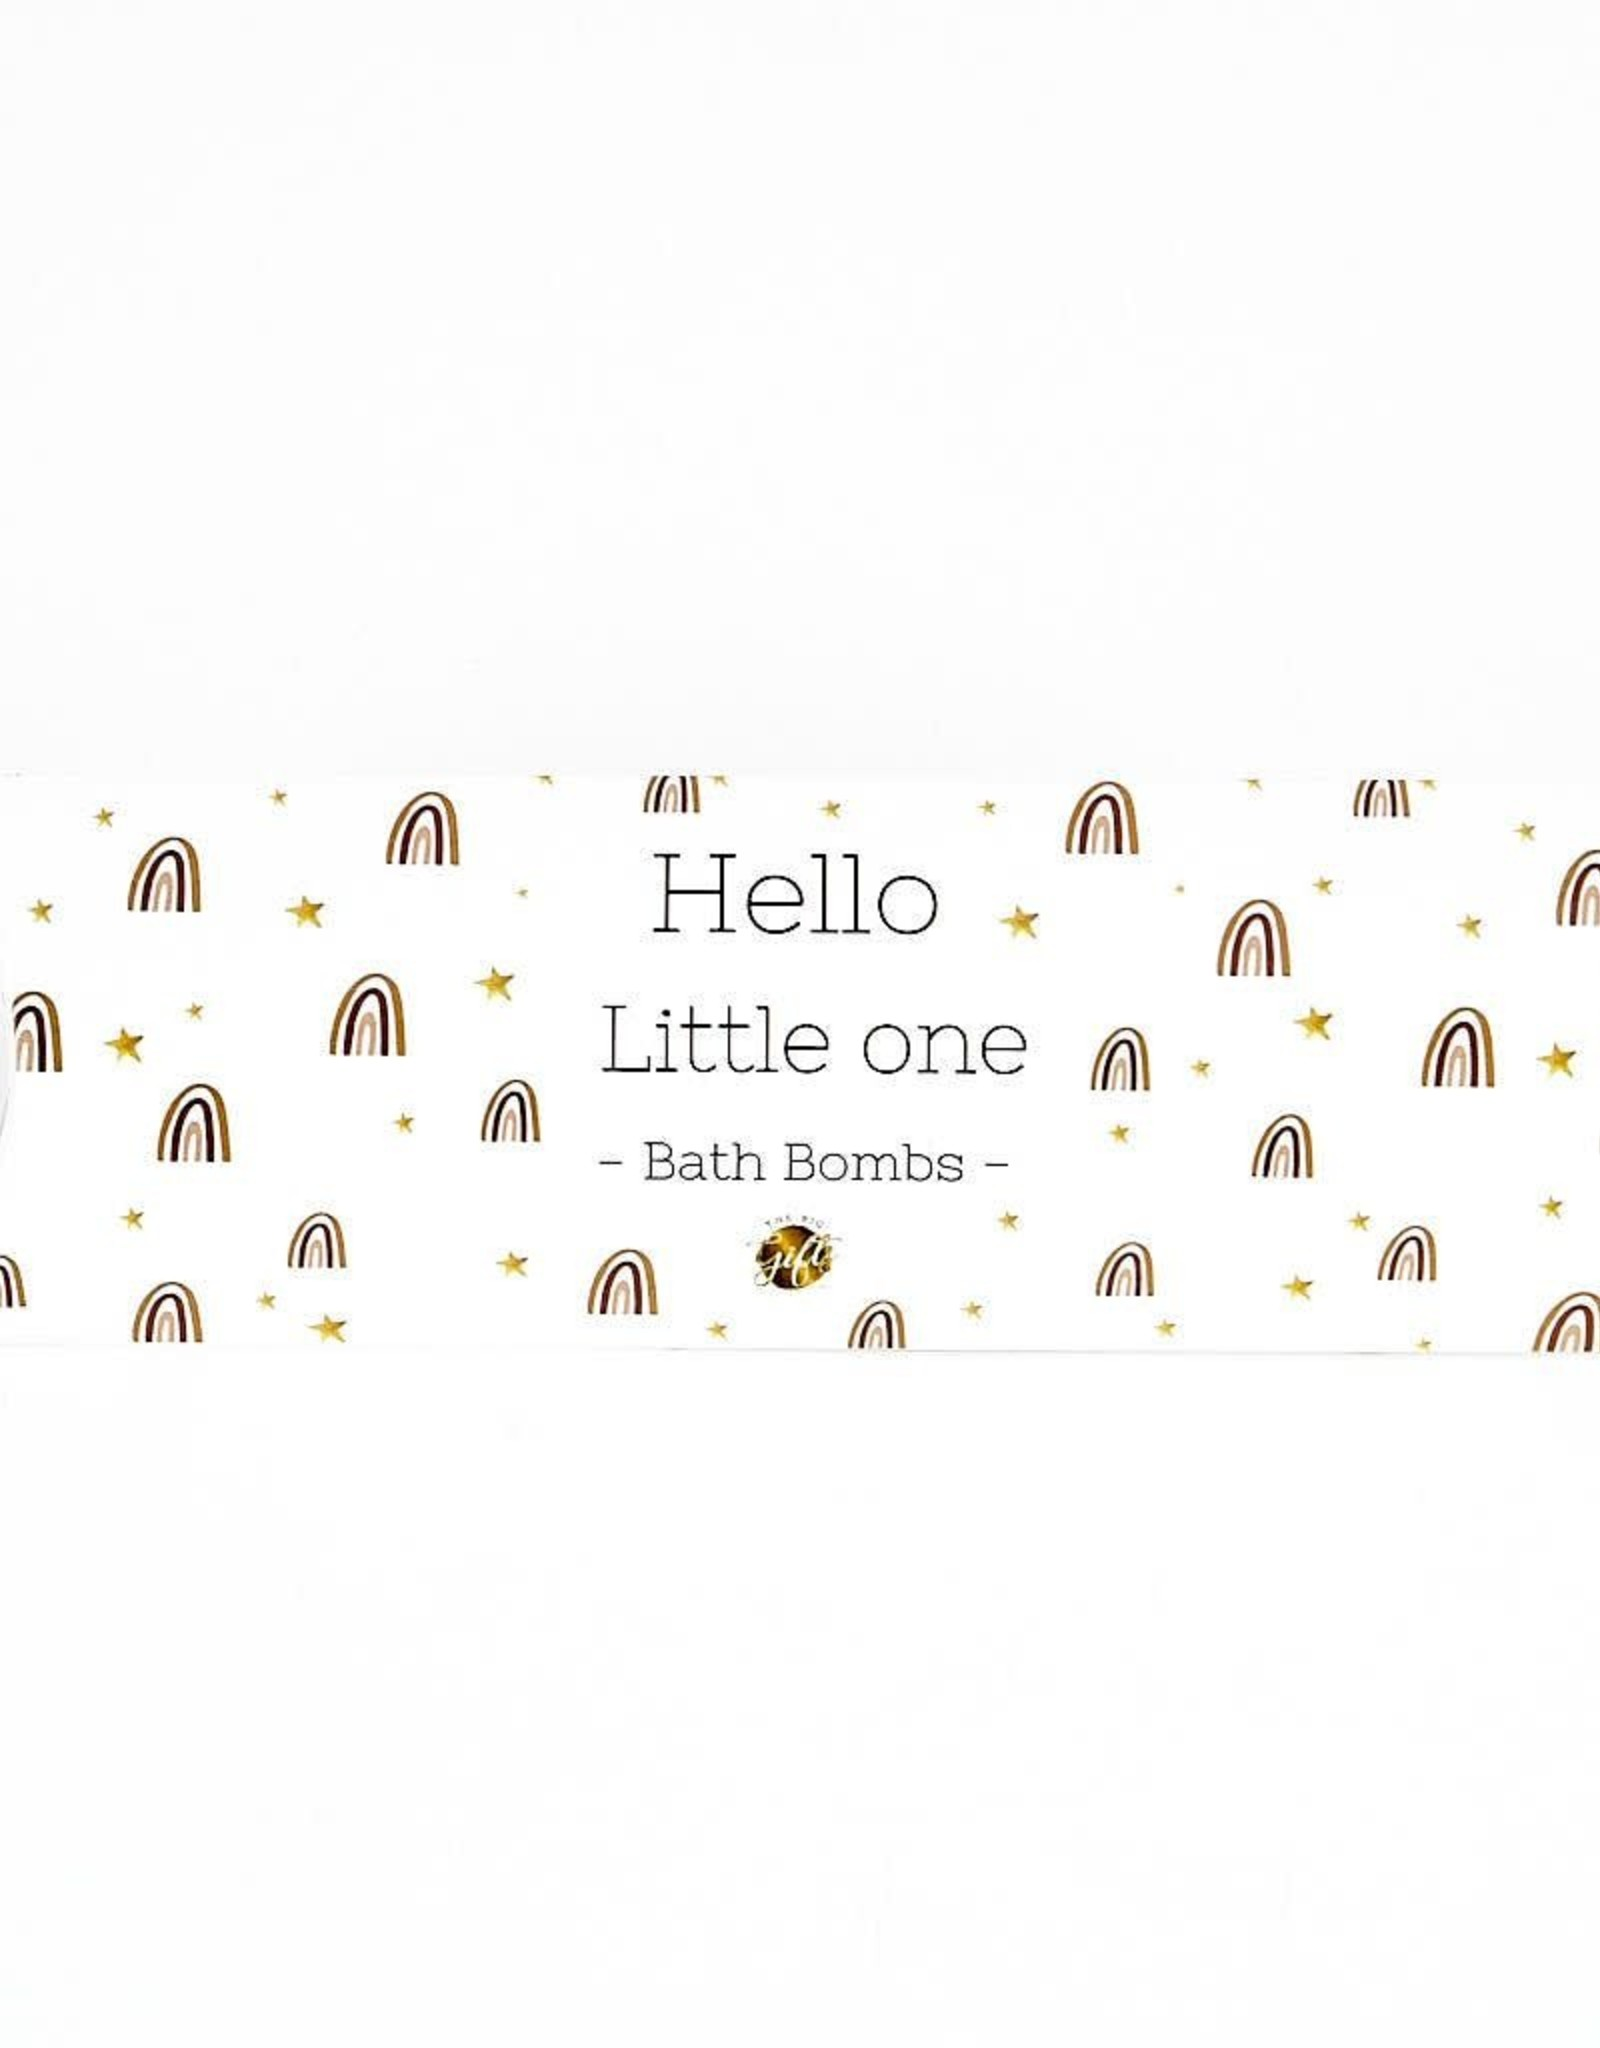 "The Big Gifts Gondeldoosje (voeten) Bath bombs ""Hello Little One"" - The Big Gifts"